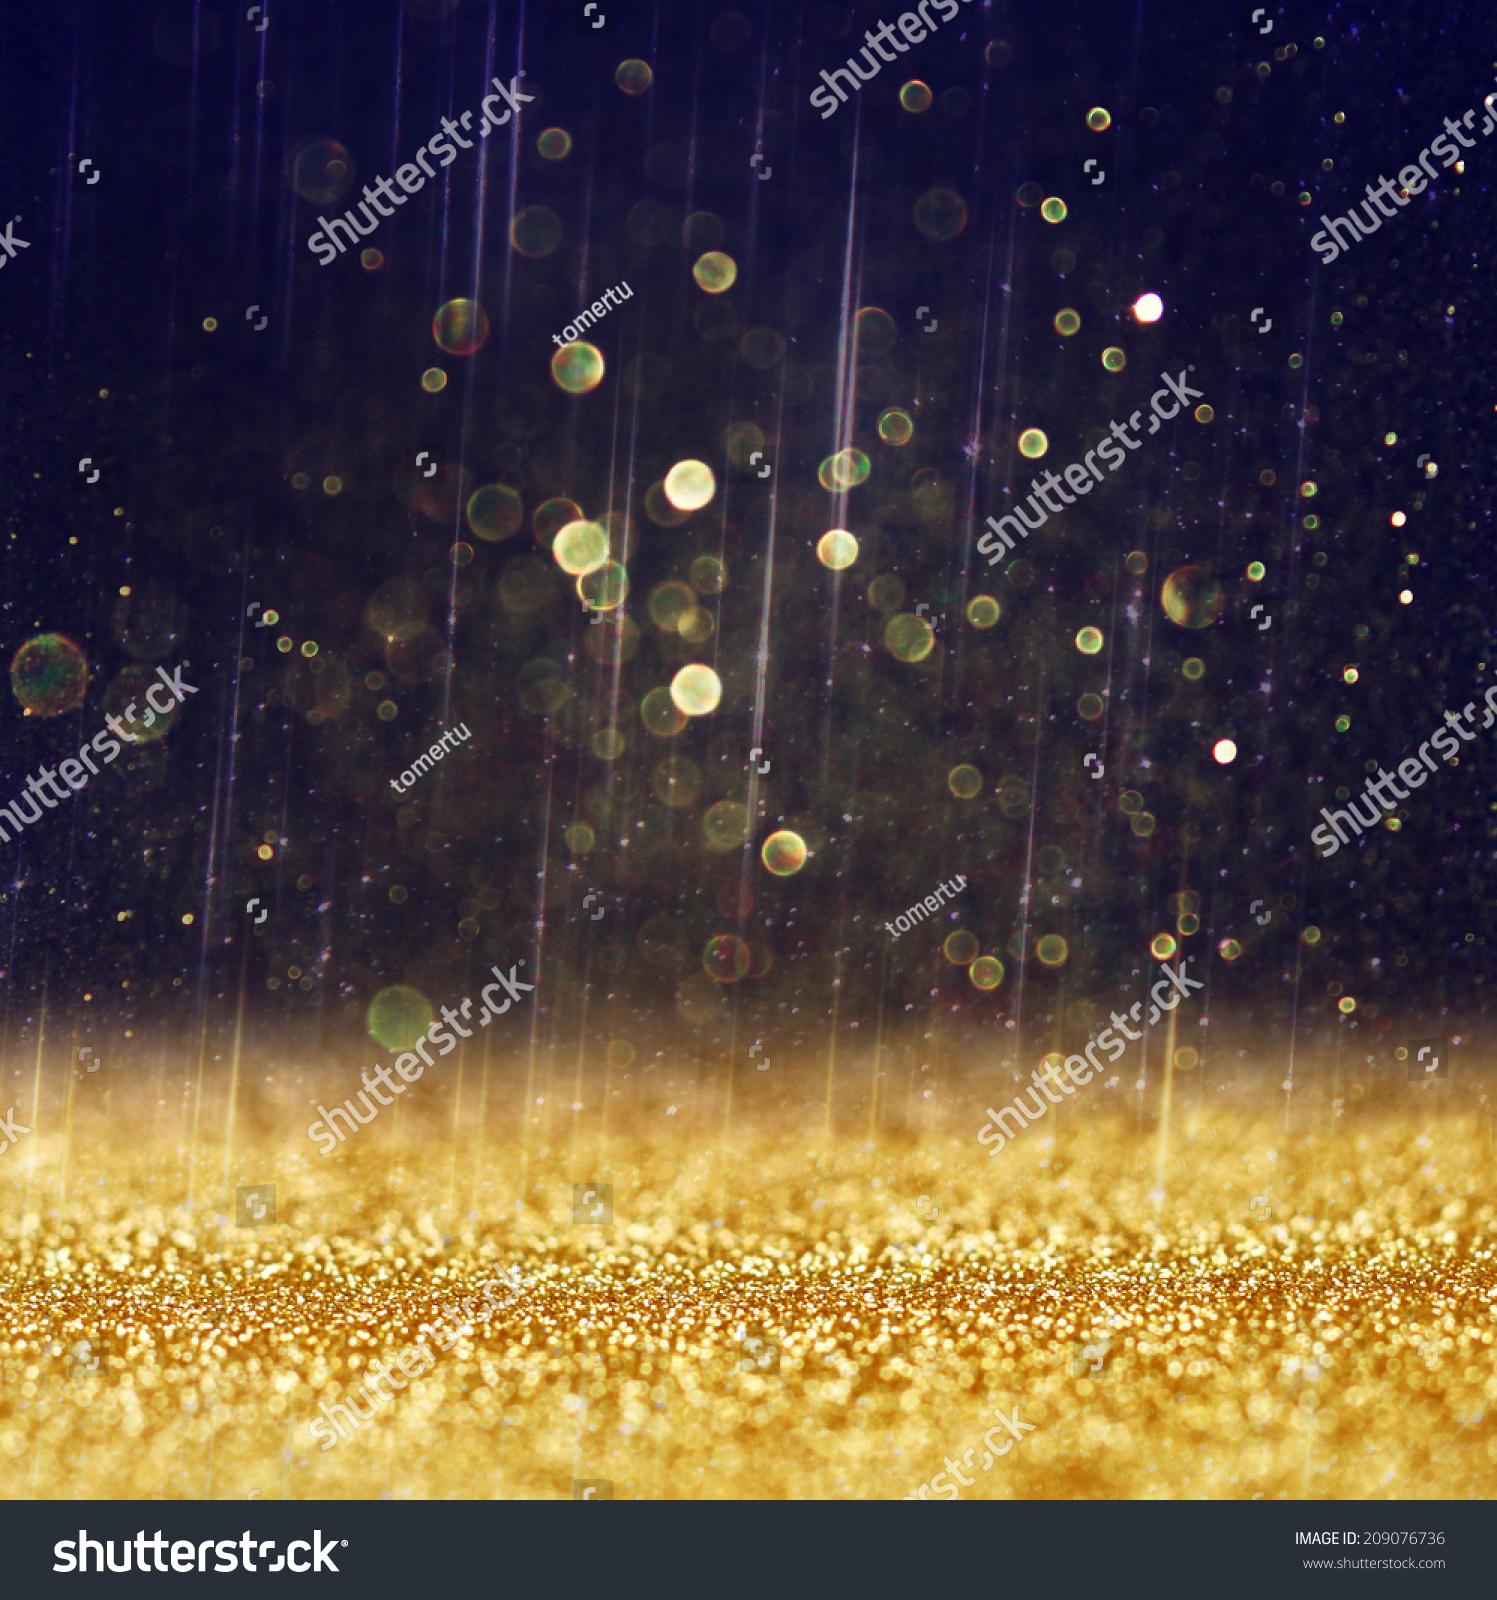 light gold vintage background - photo #45